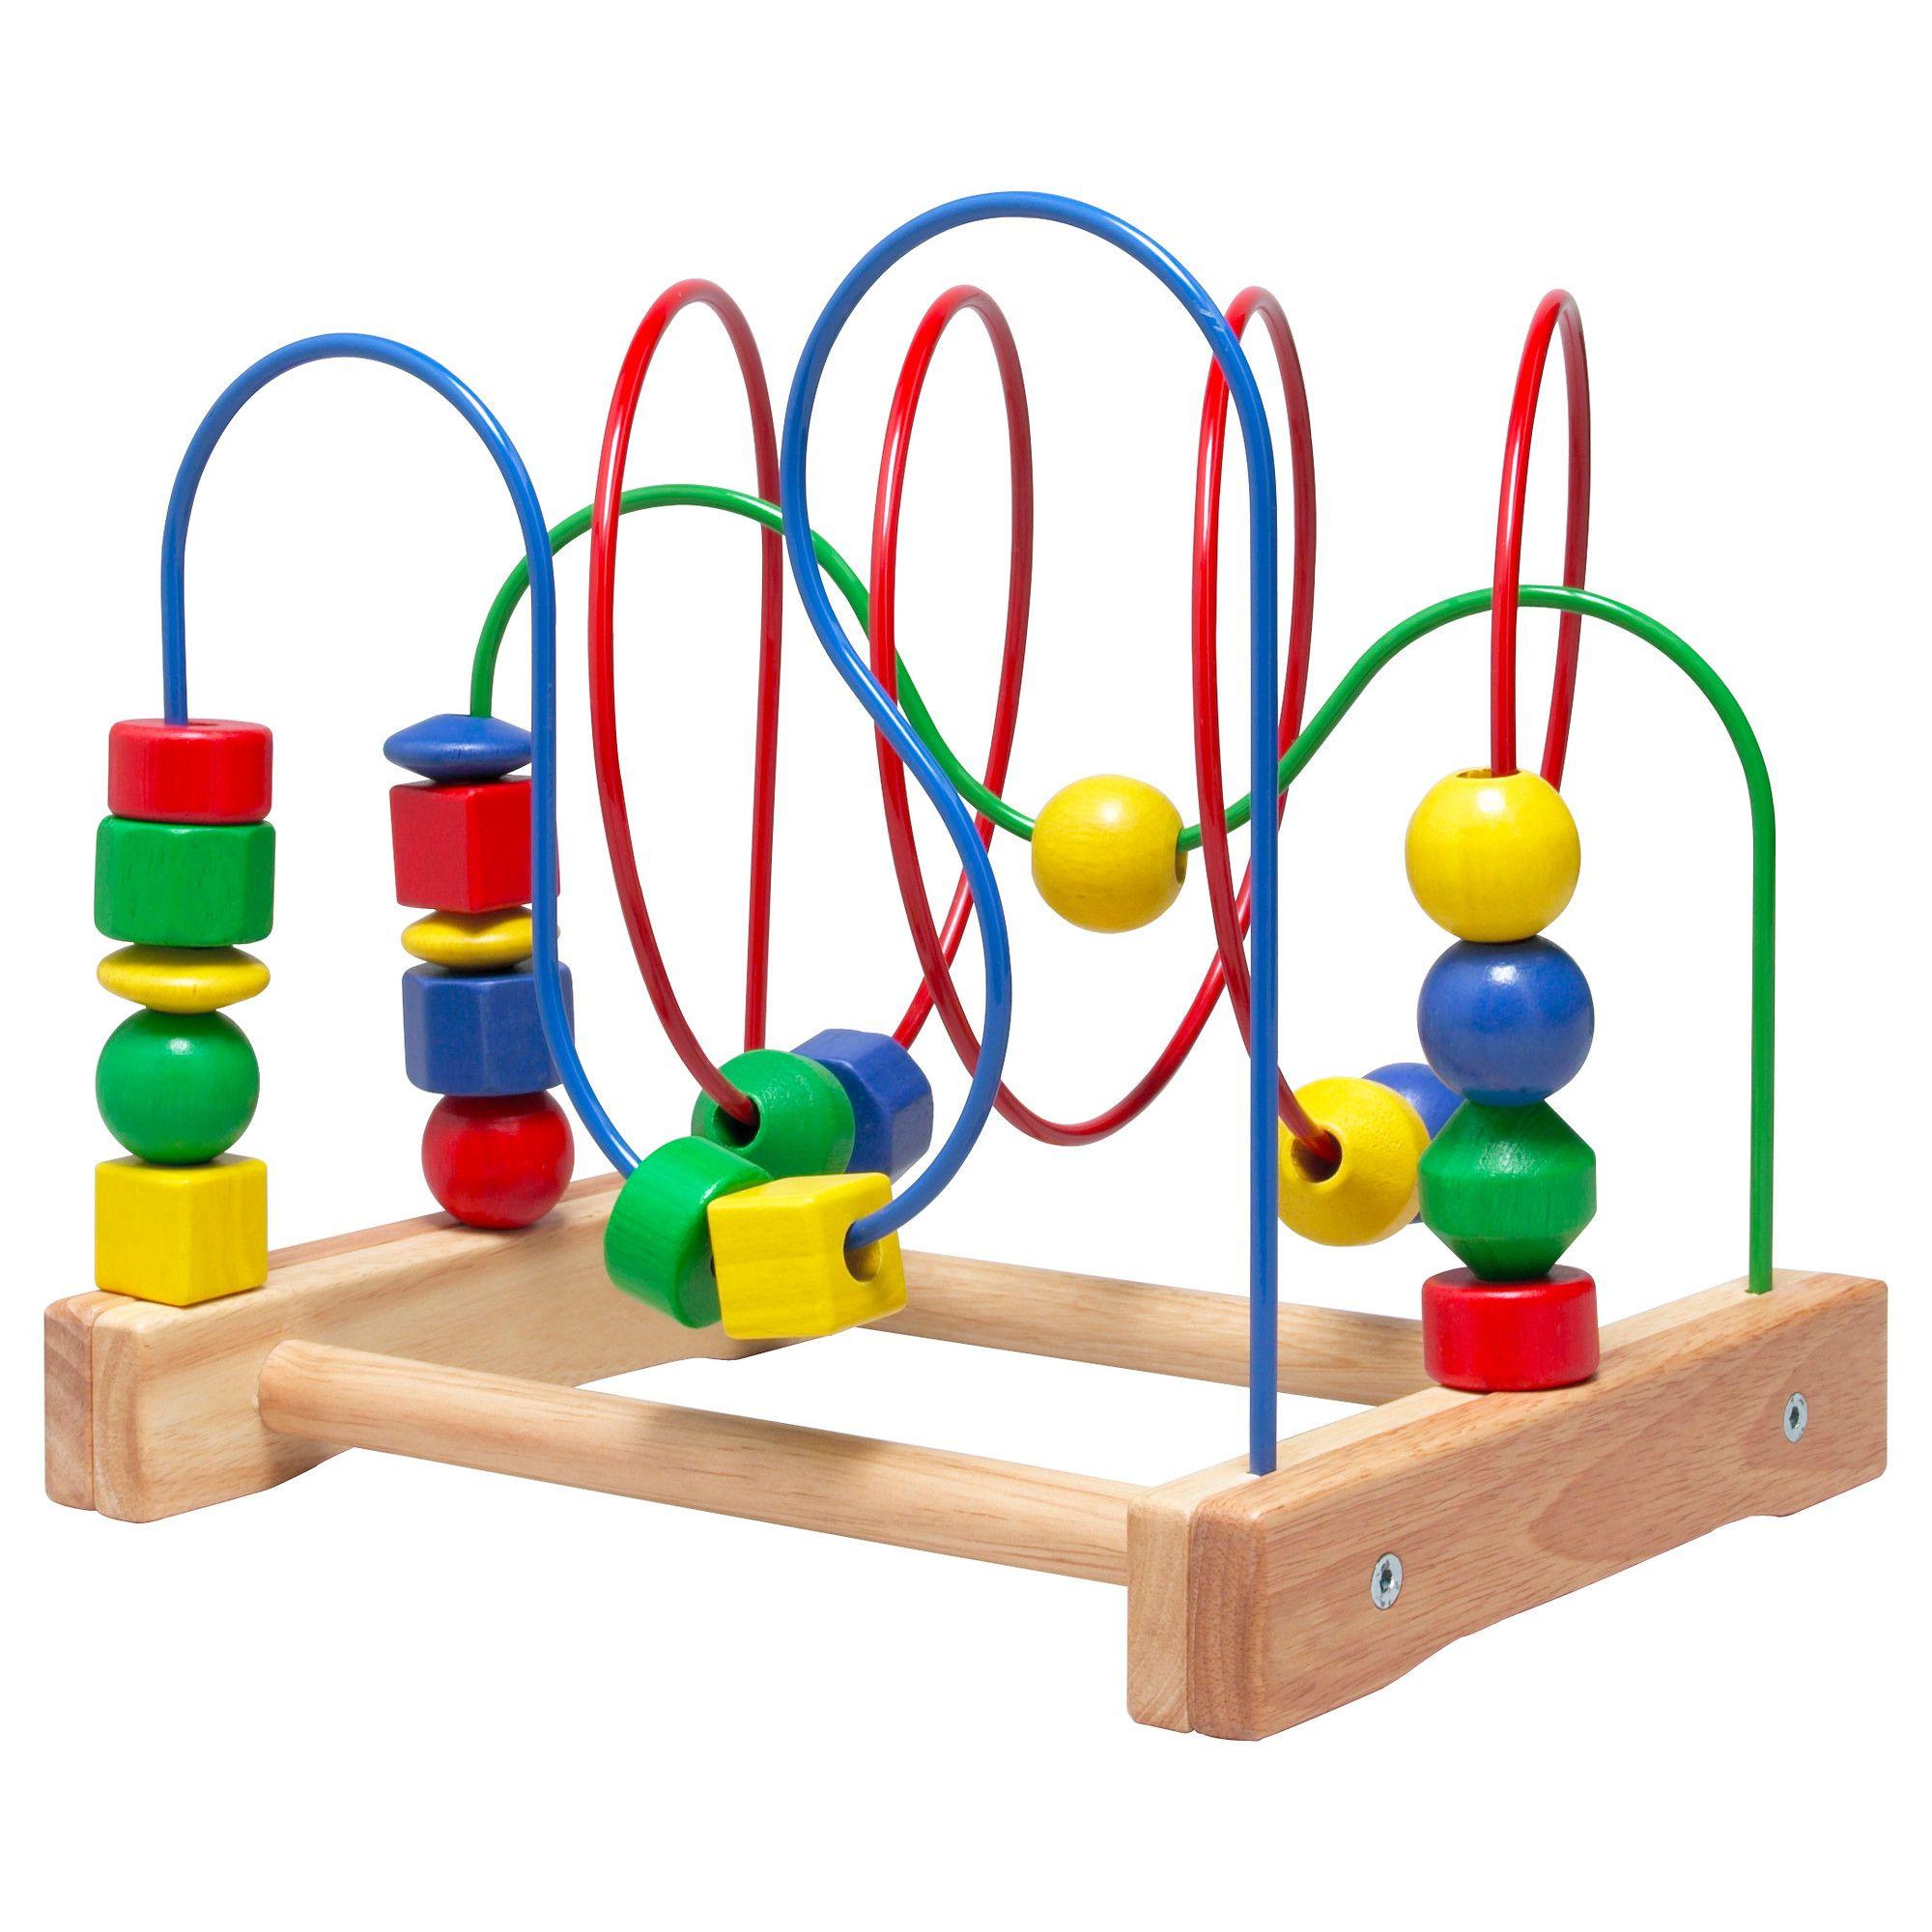 a017579bb9a23 MULA Bead roller coaster - IKEA. MULA Bead roller coaster - IKEA Ikea Mula